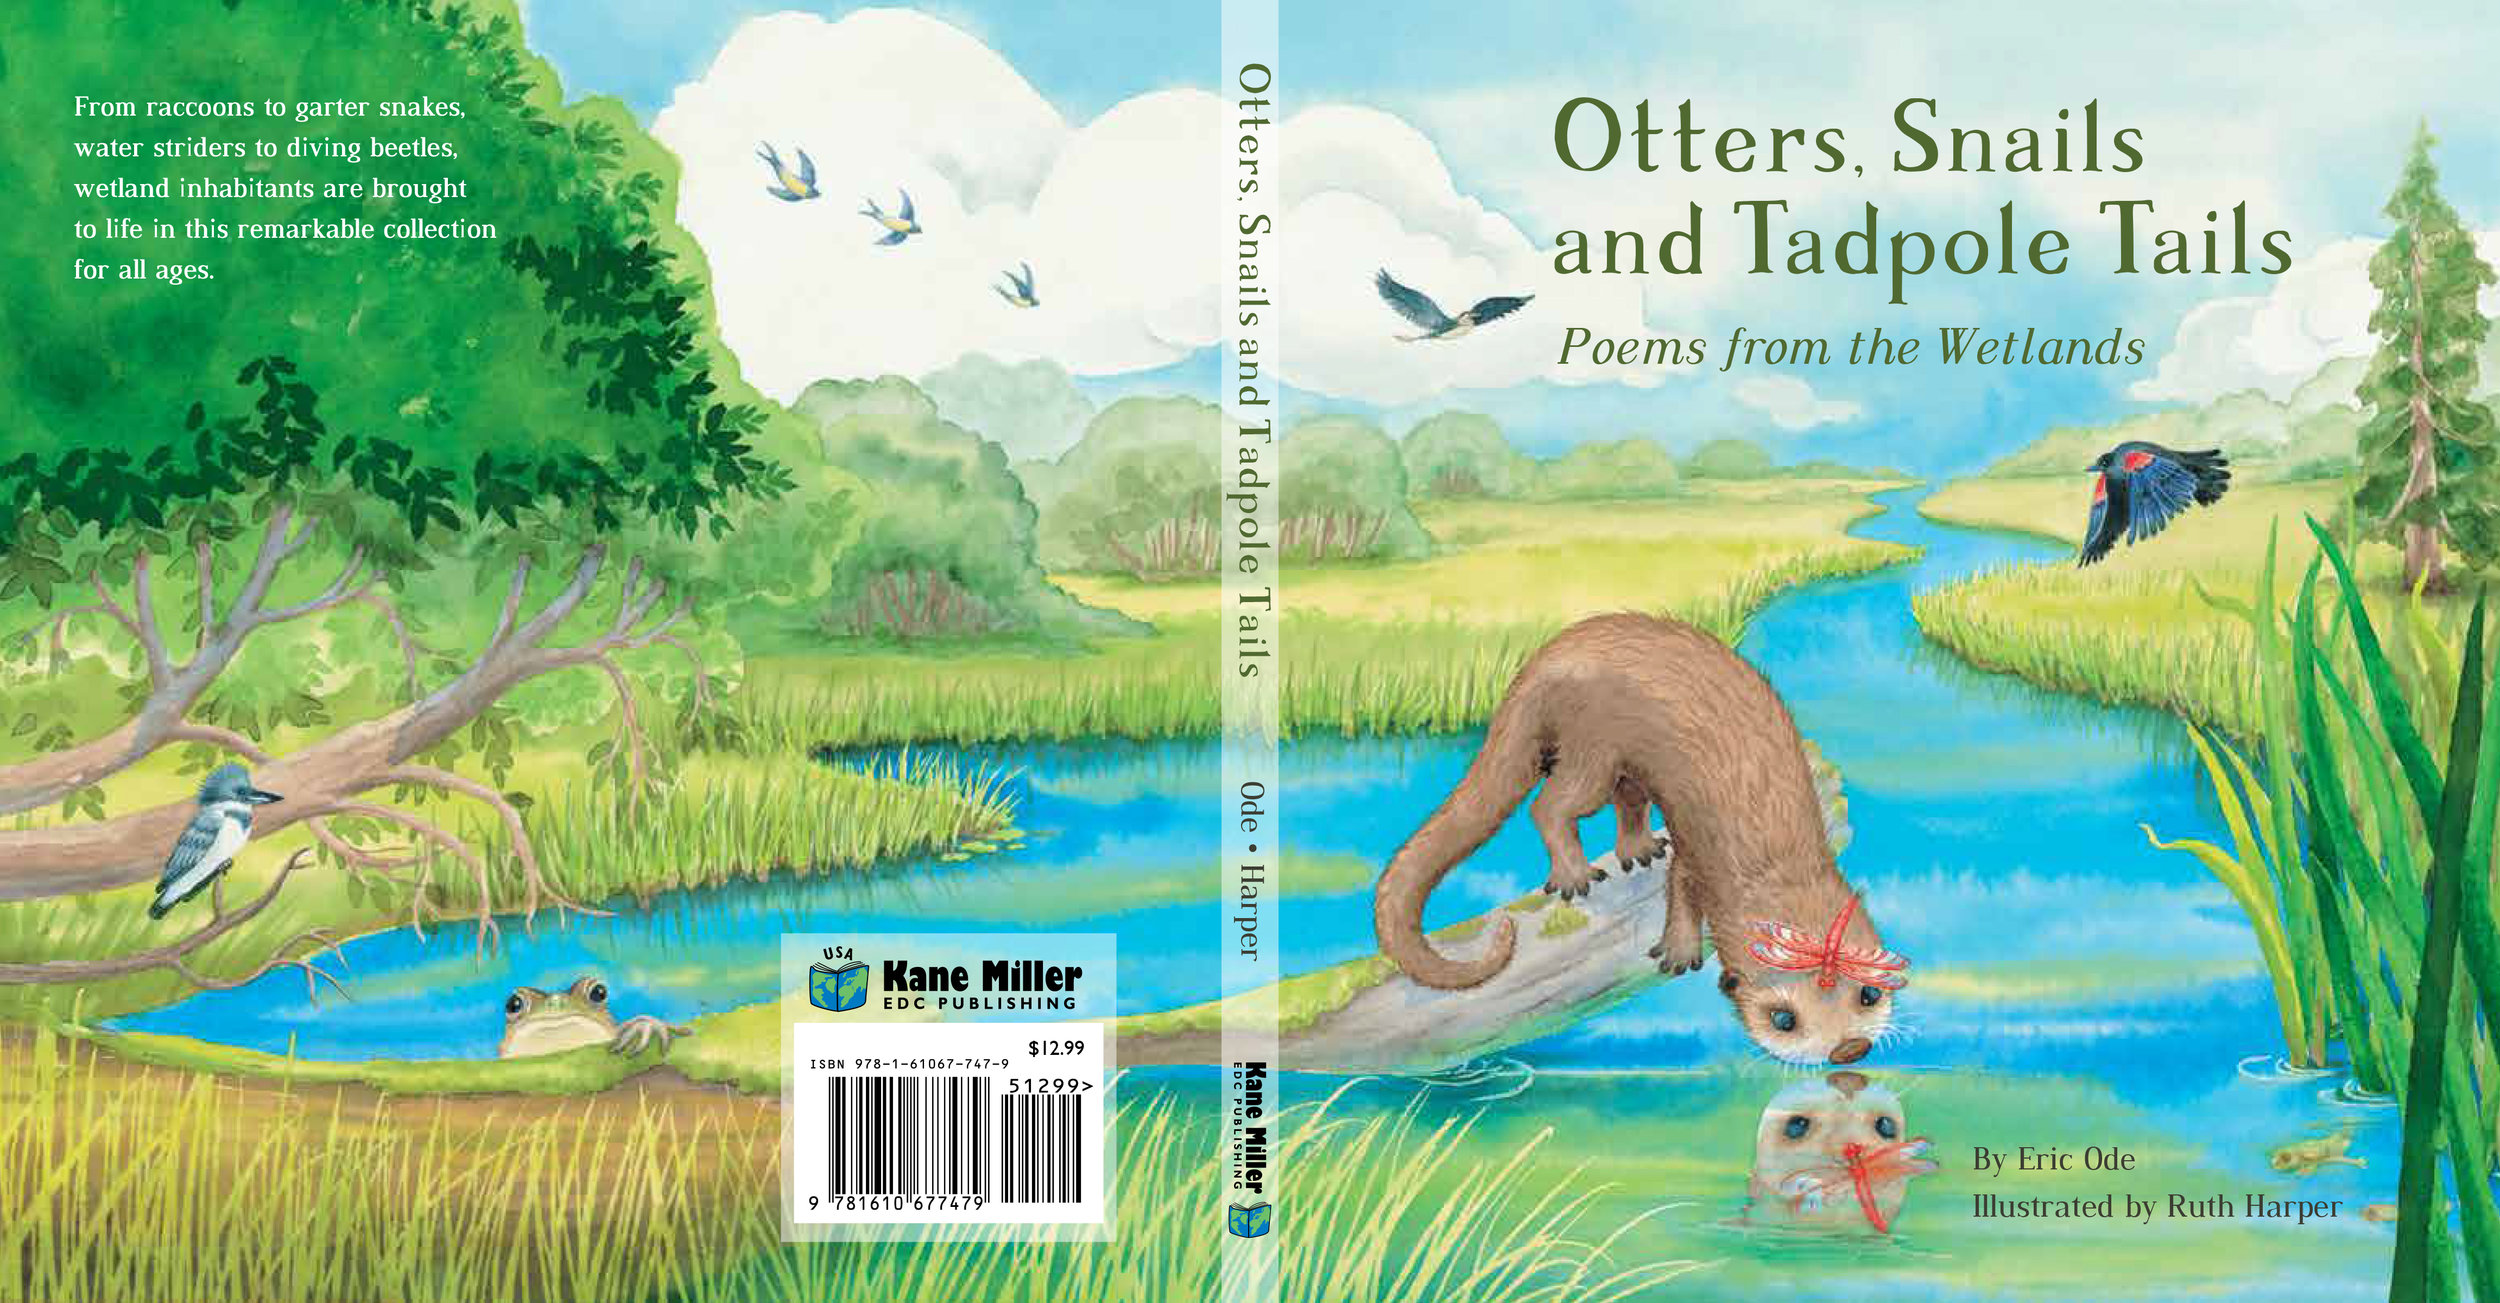 OttersSnailsTadpoleTales_Cvr2.jpg